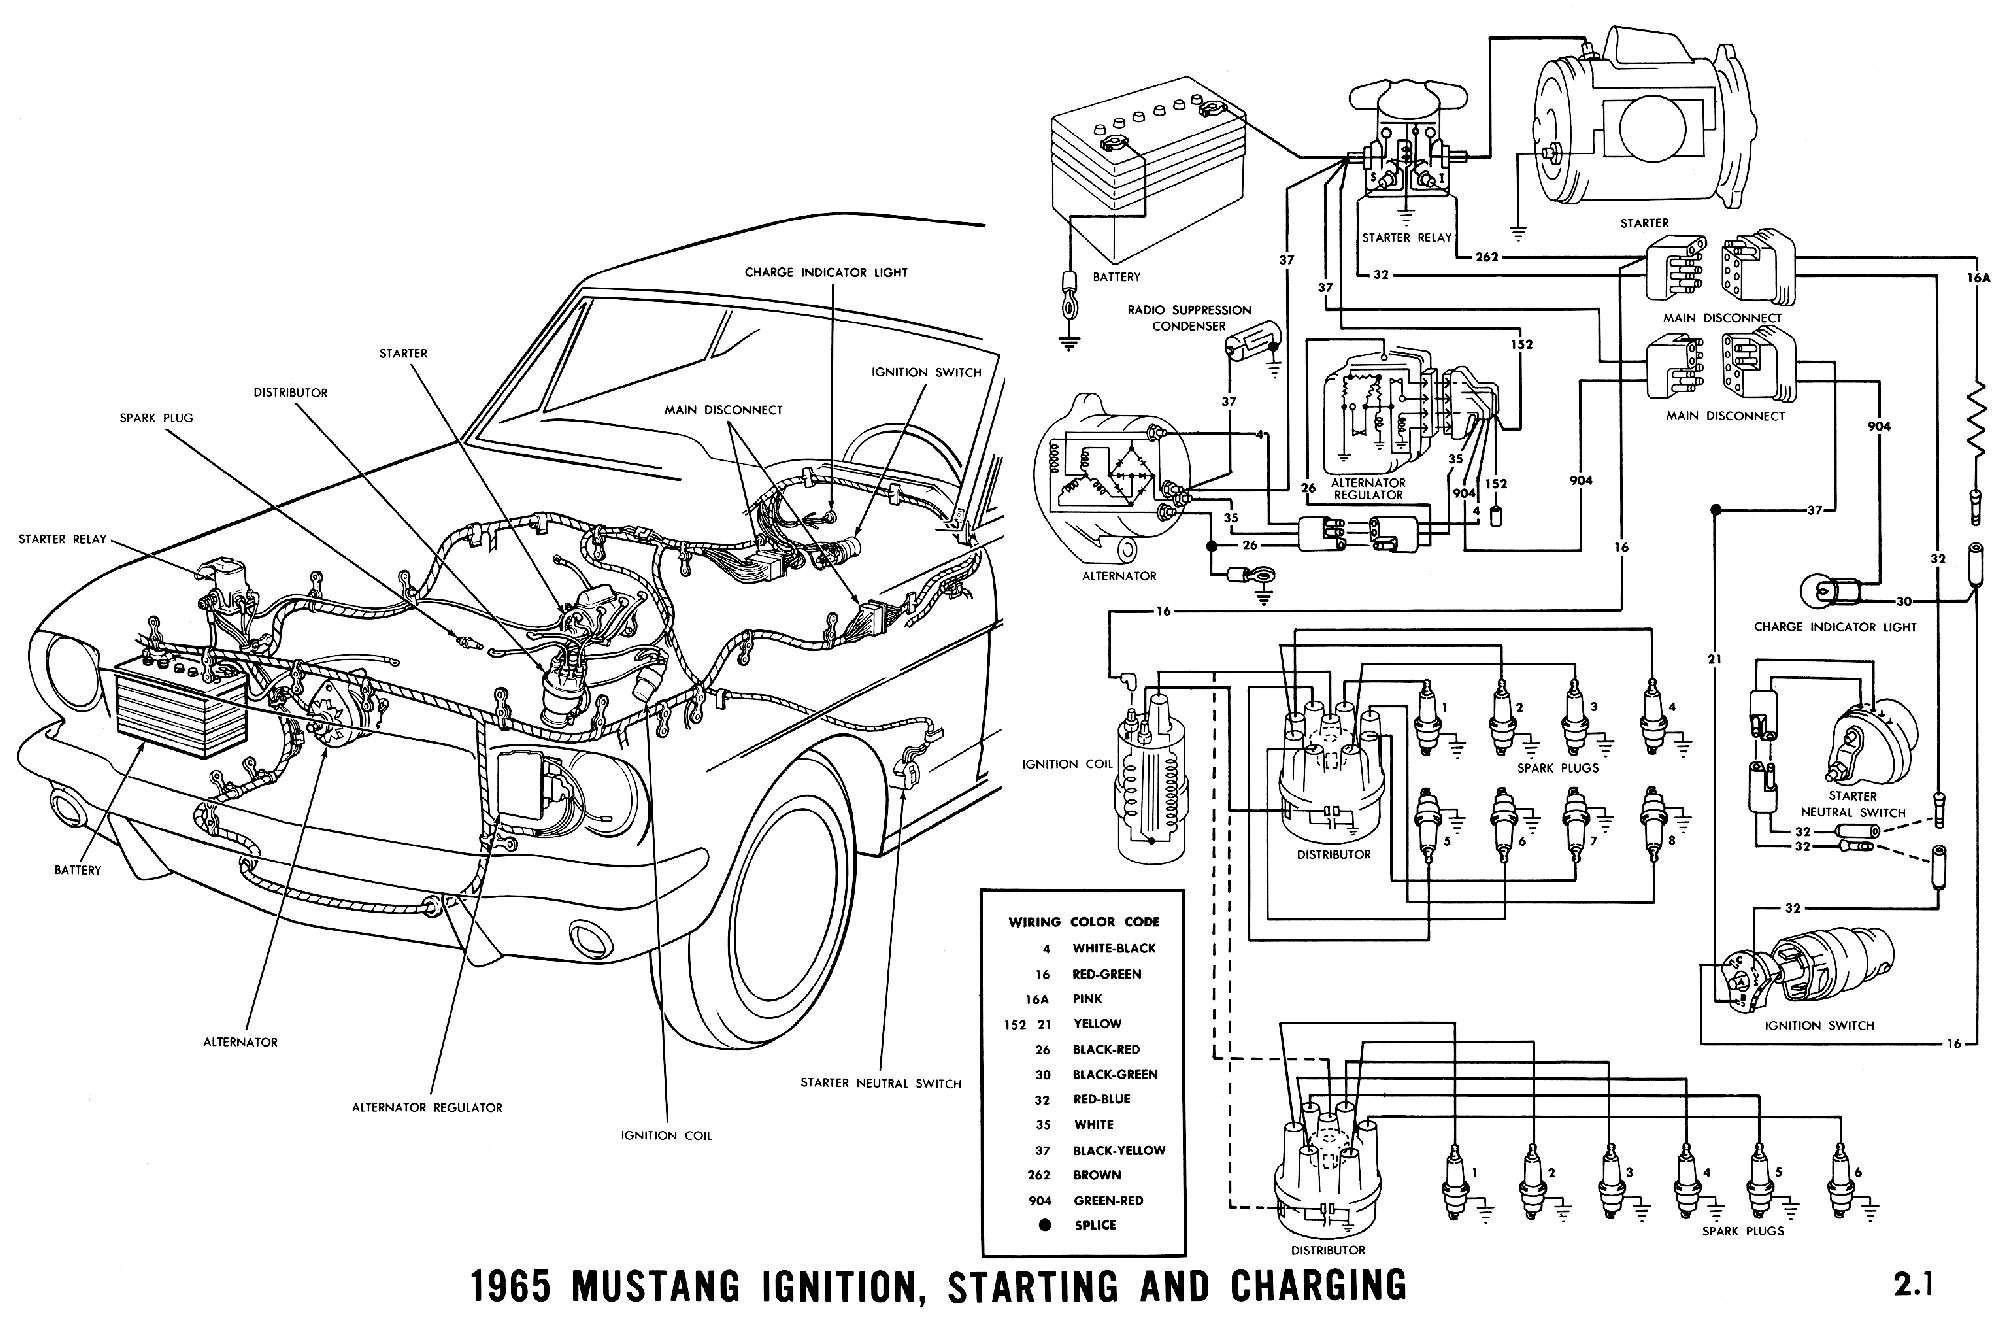 Car Under Hood Diagram Car Parts Diagram Under Hood 2015 Mustang Engine Diagram Engine Car Of Car Under Hood Diagram